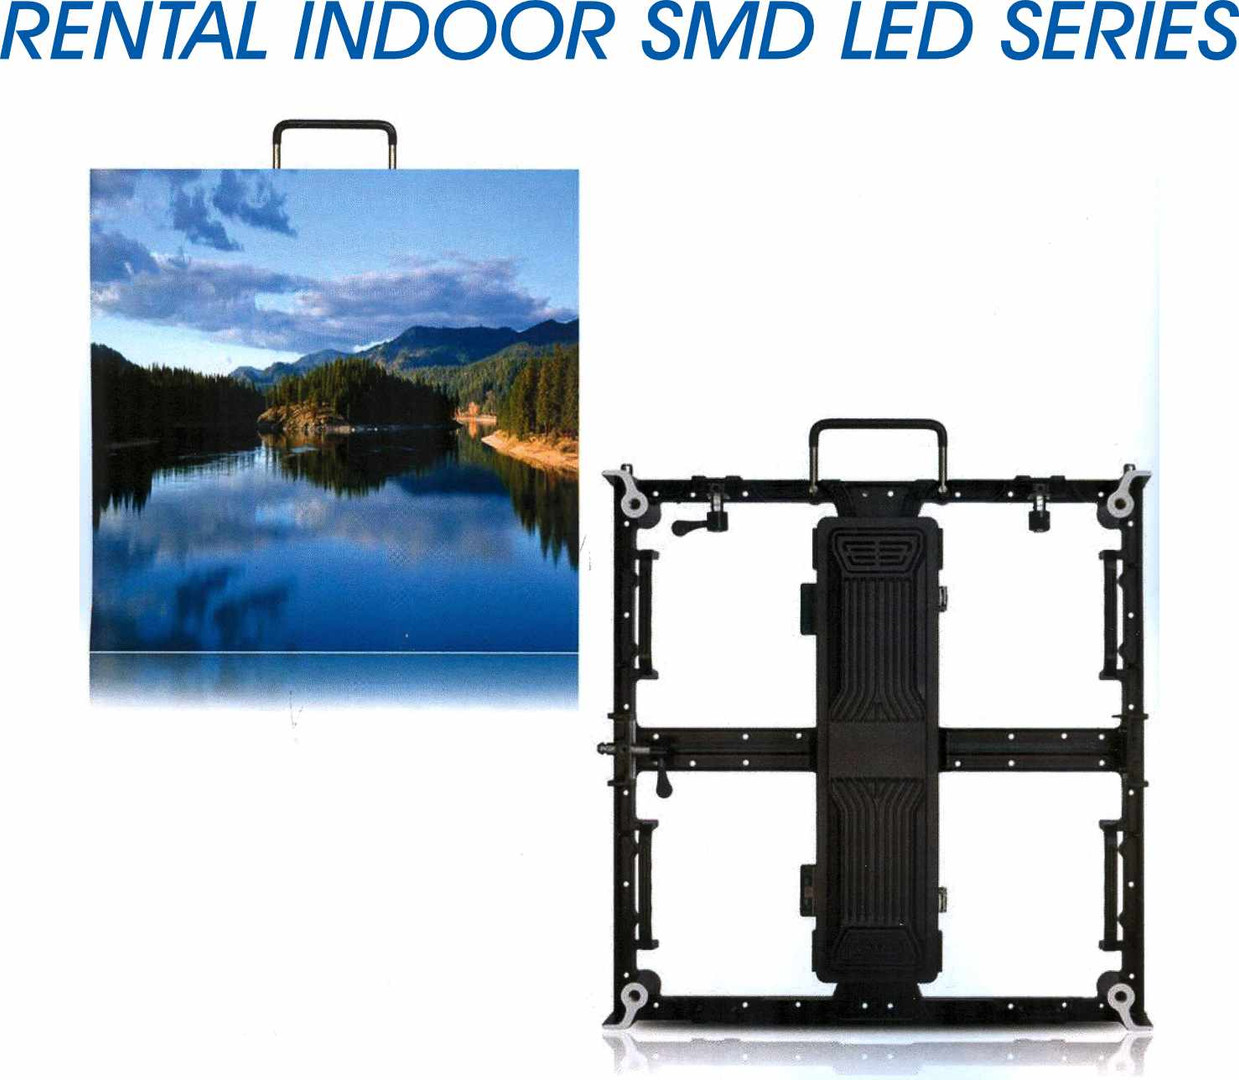 RENTAL INDOOR SMD LED SERIES.jpg